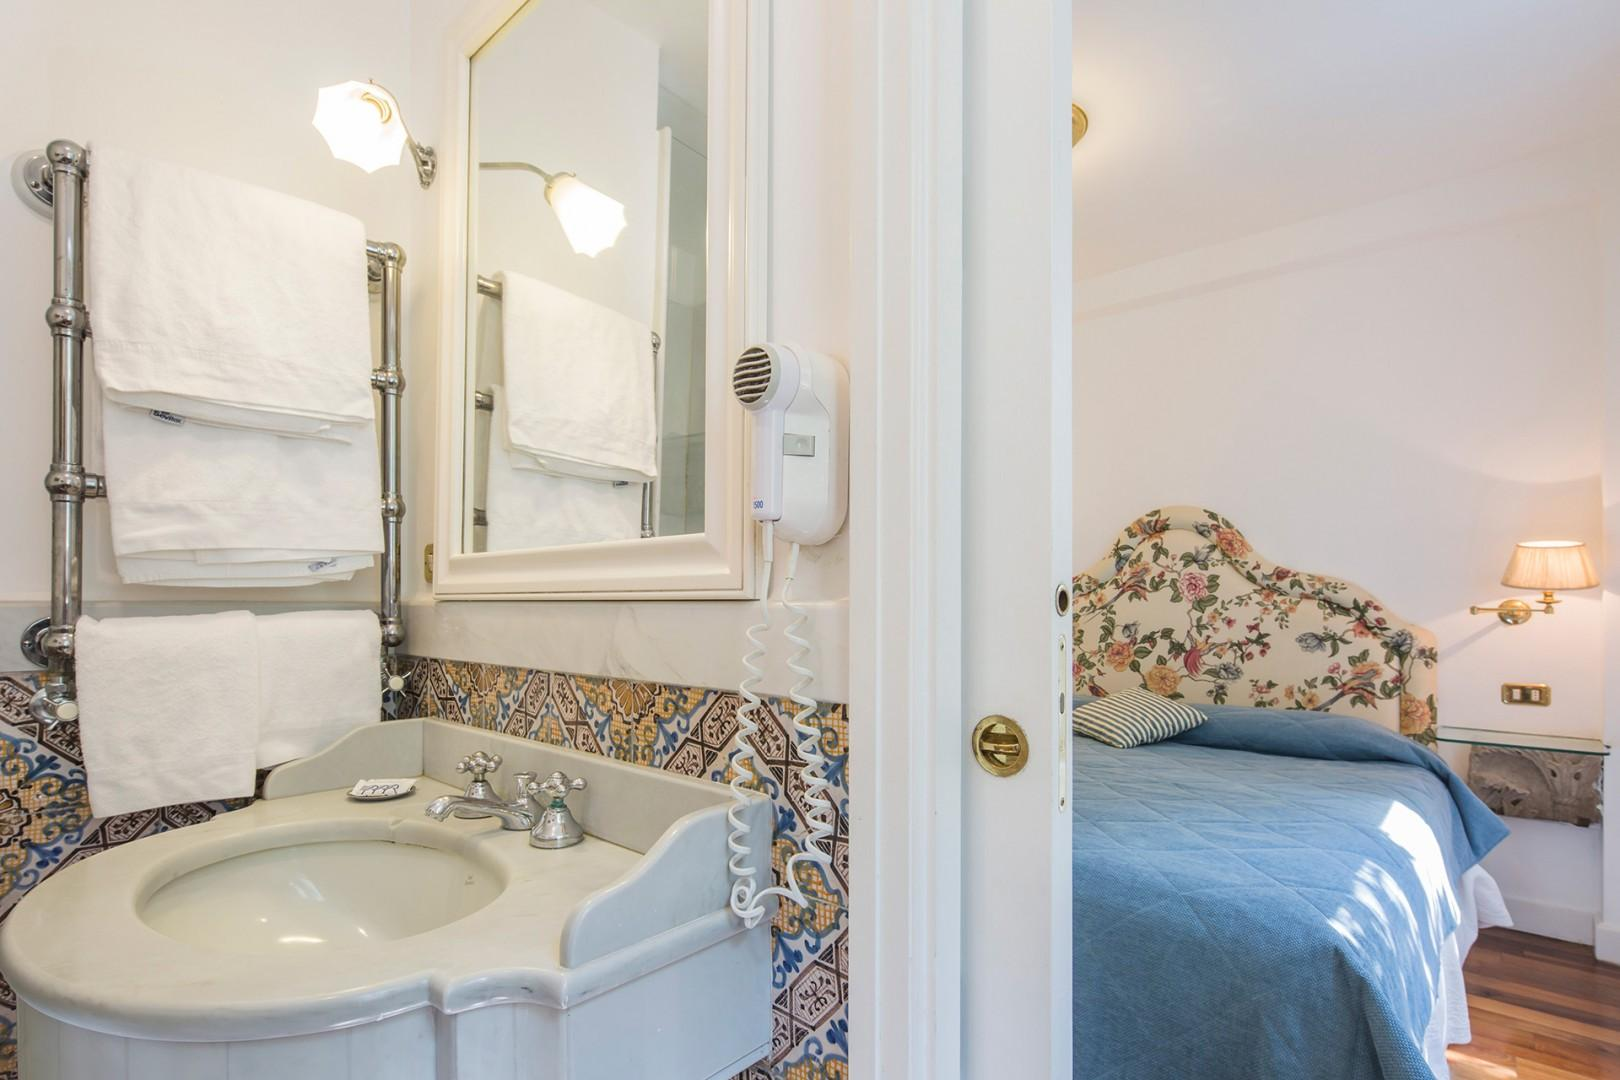 En suite bathroom to bedroom 2 has shower, sink, toilet and bidet.